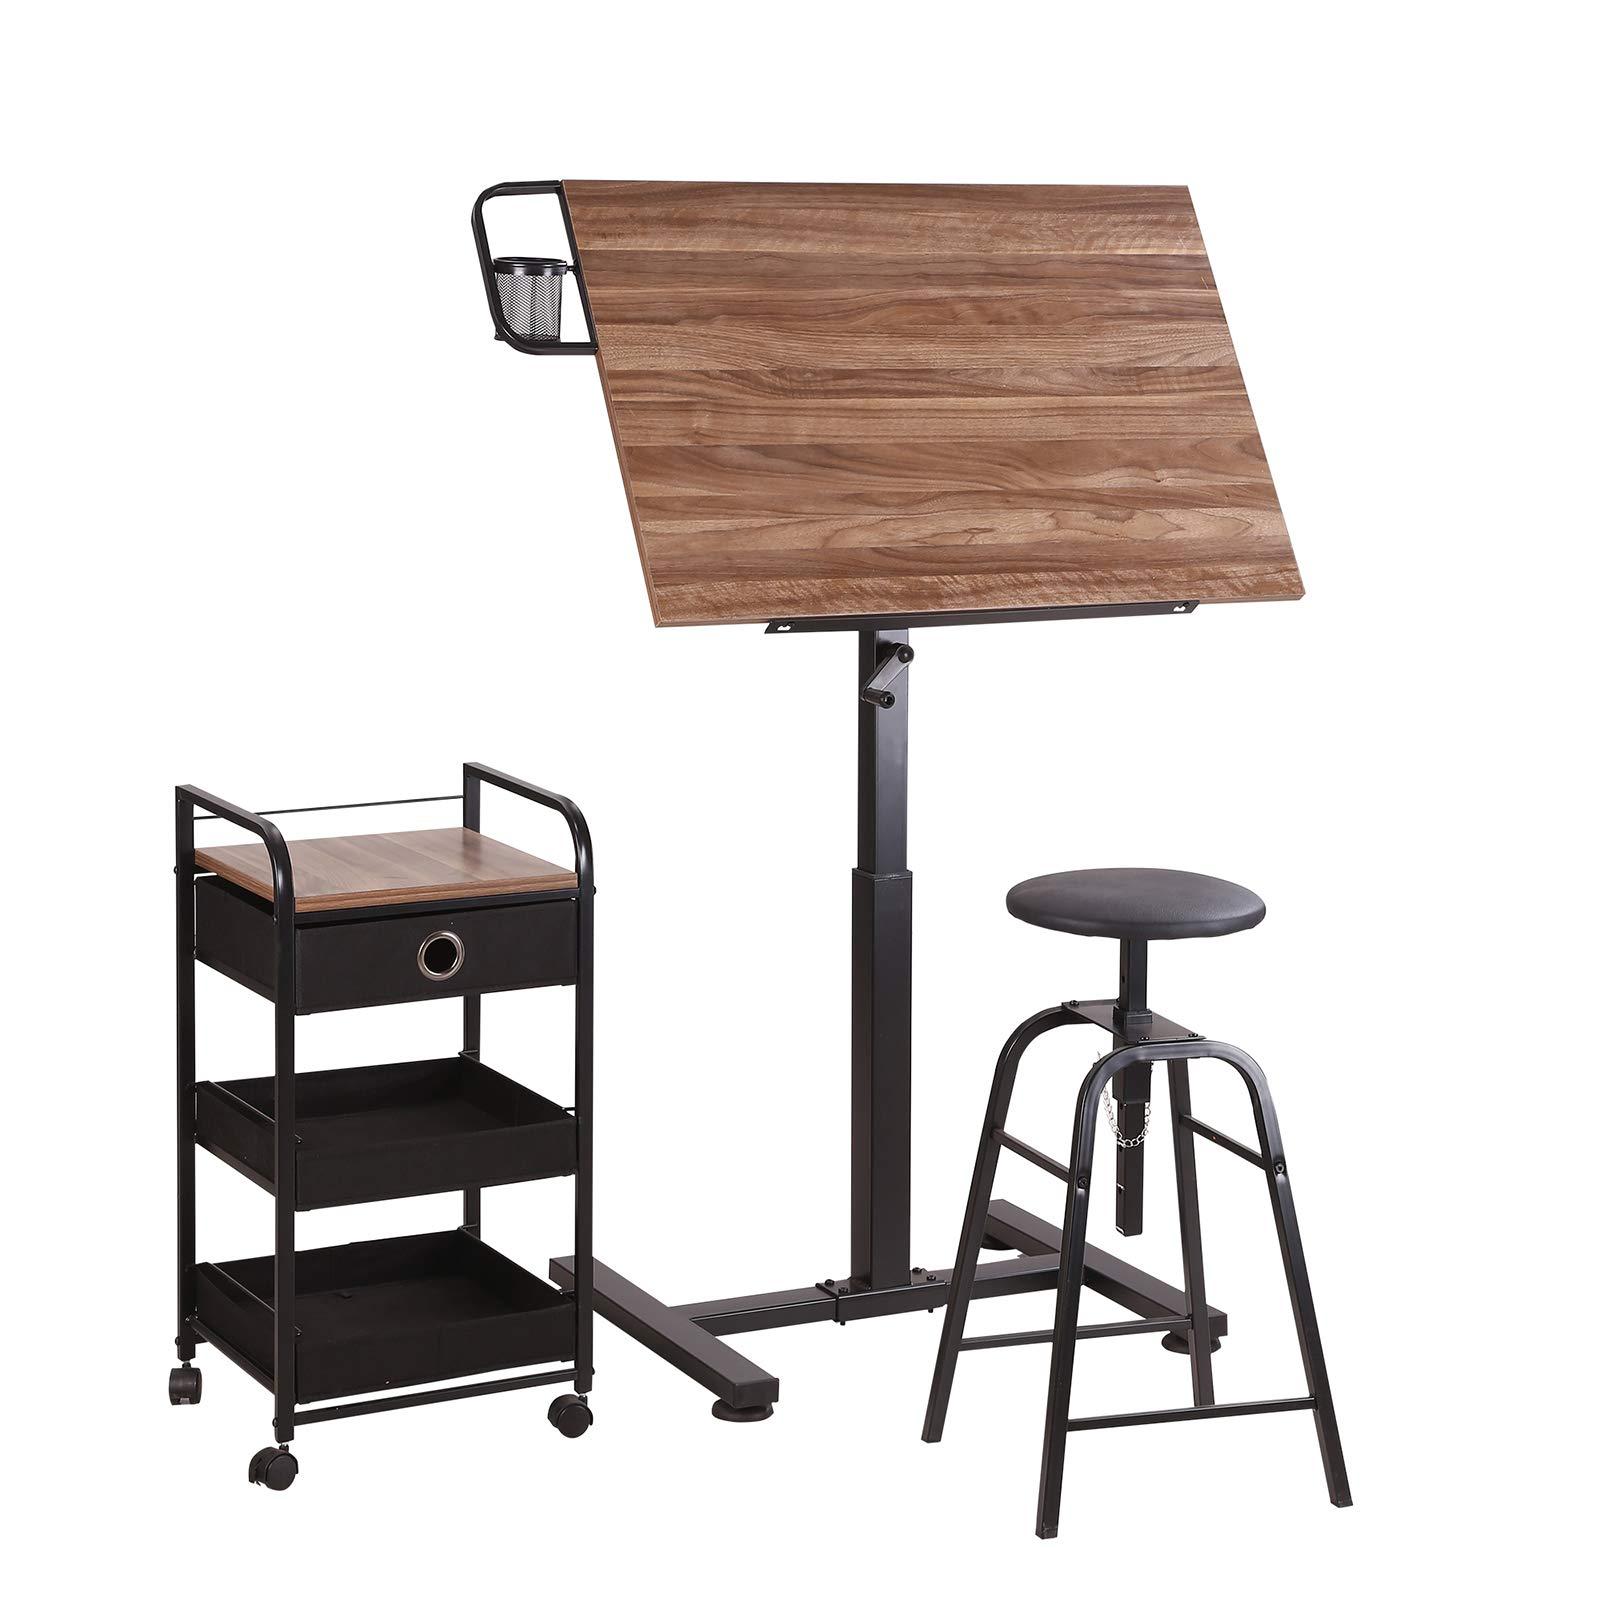 Sit Stand Draft Table Set by Artist's Loft by Artist's Loft